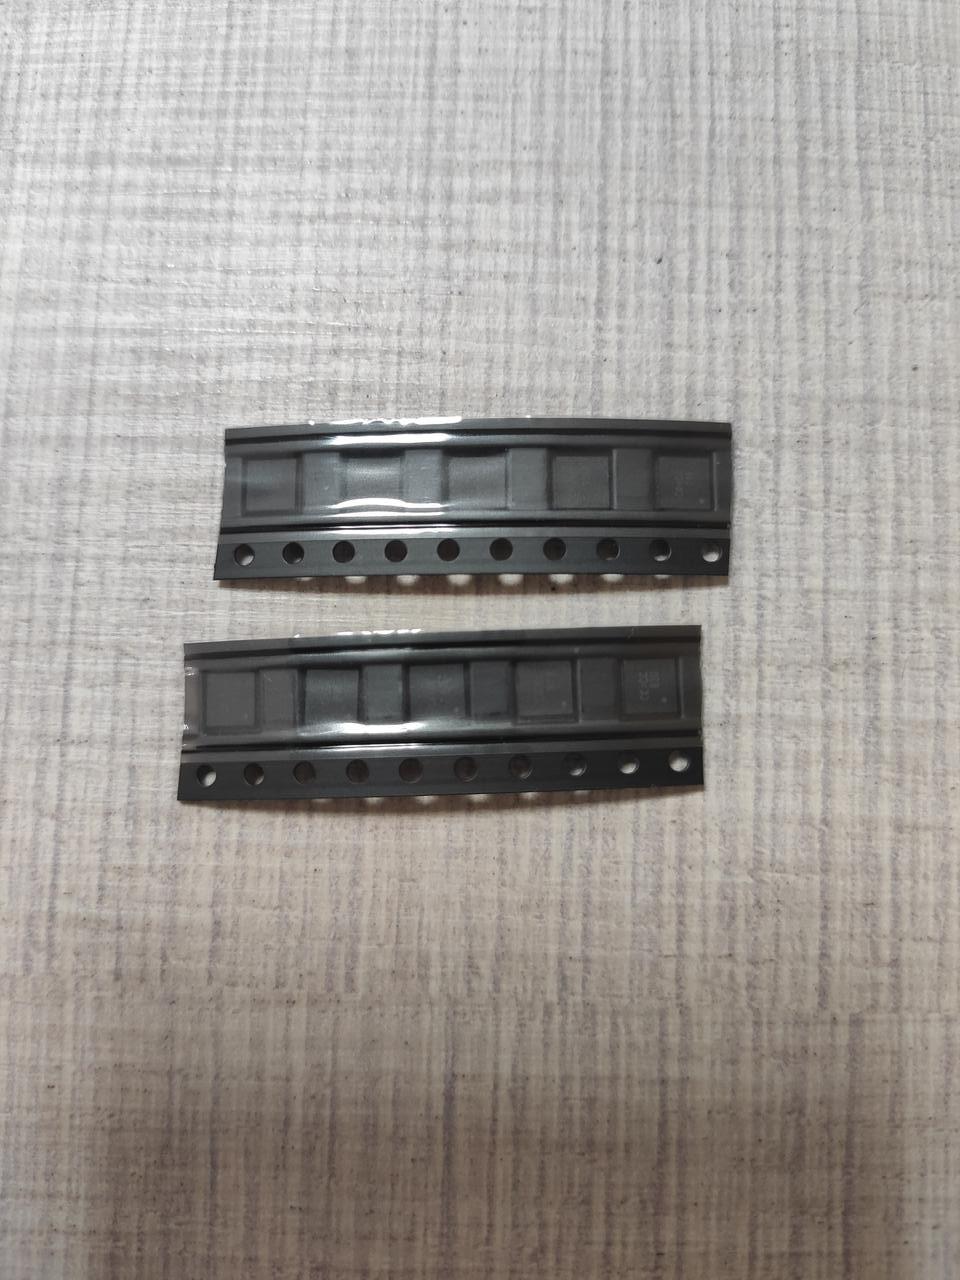 ШИМ контроллер PWM RT8167B RT8168B RT8204A RT8204PQW RT8205B QFN ck=